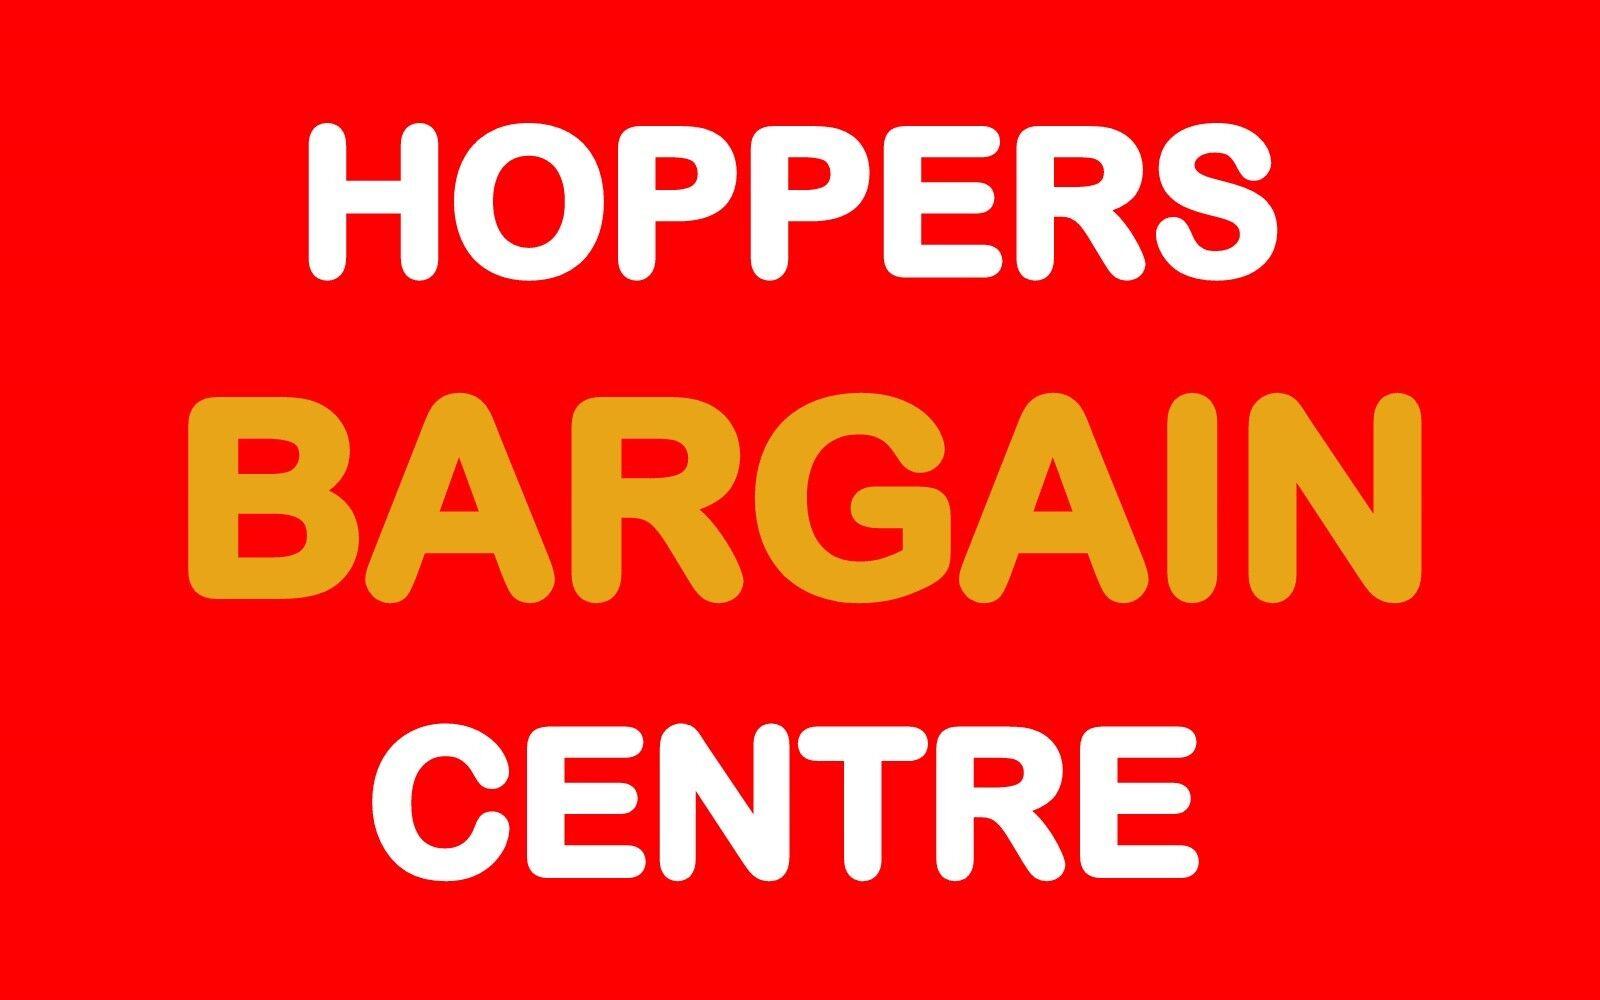 Hoppers Bargain Centre